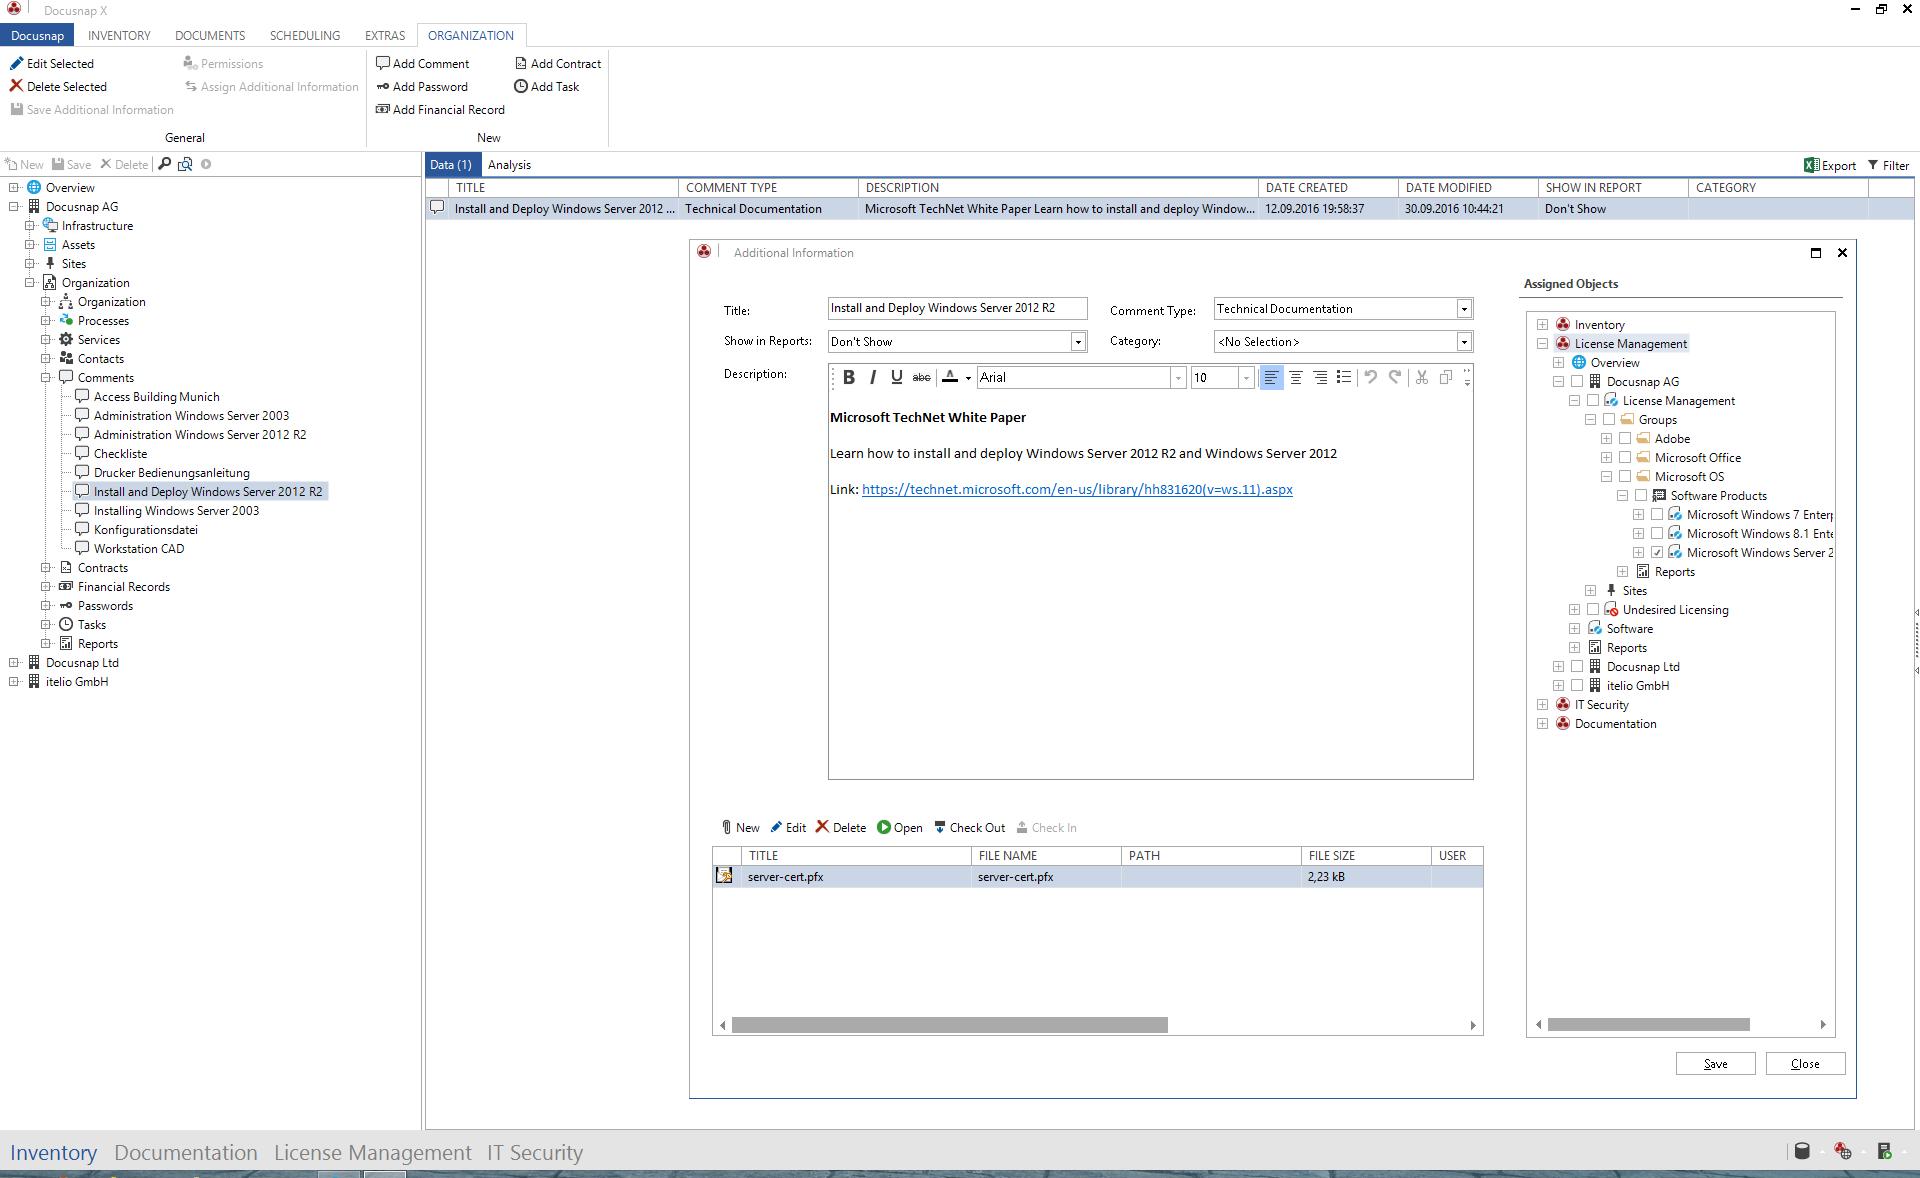 Screenshot: File attachments